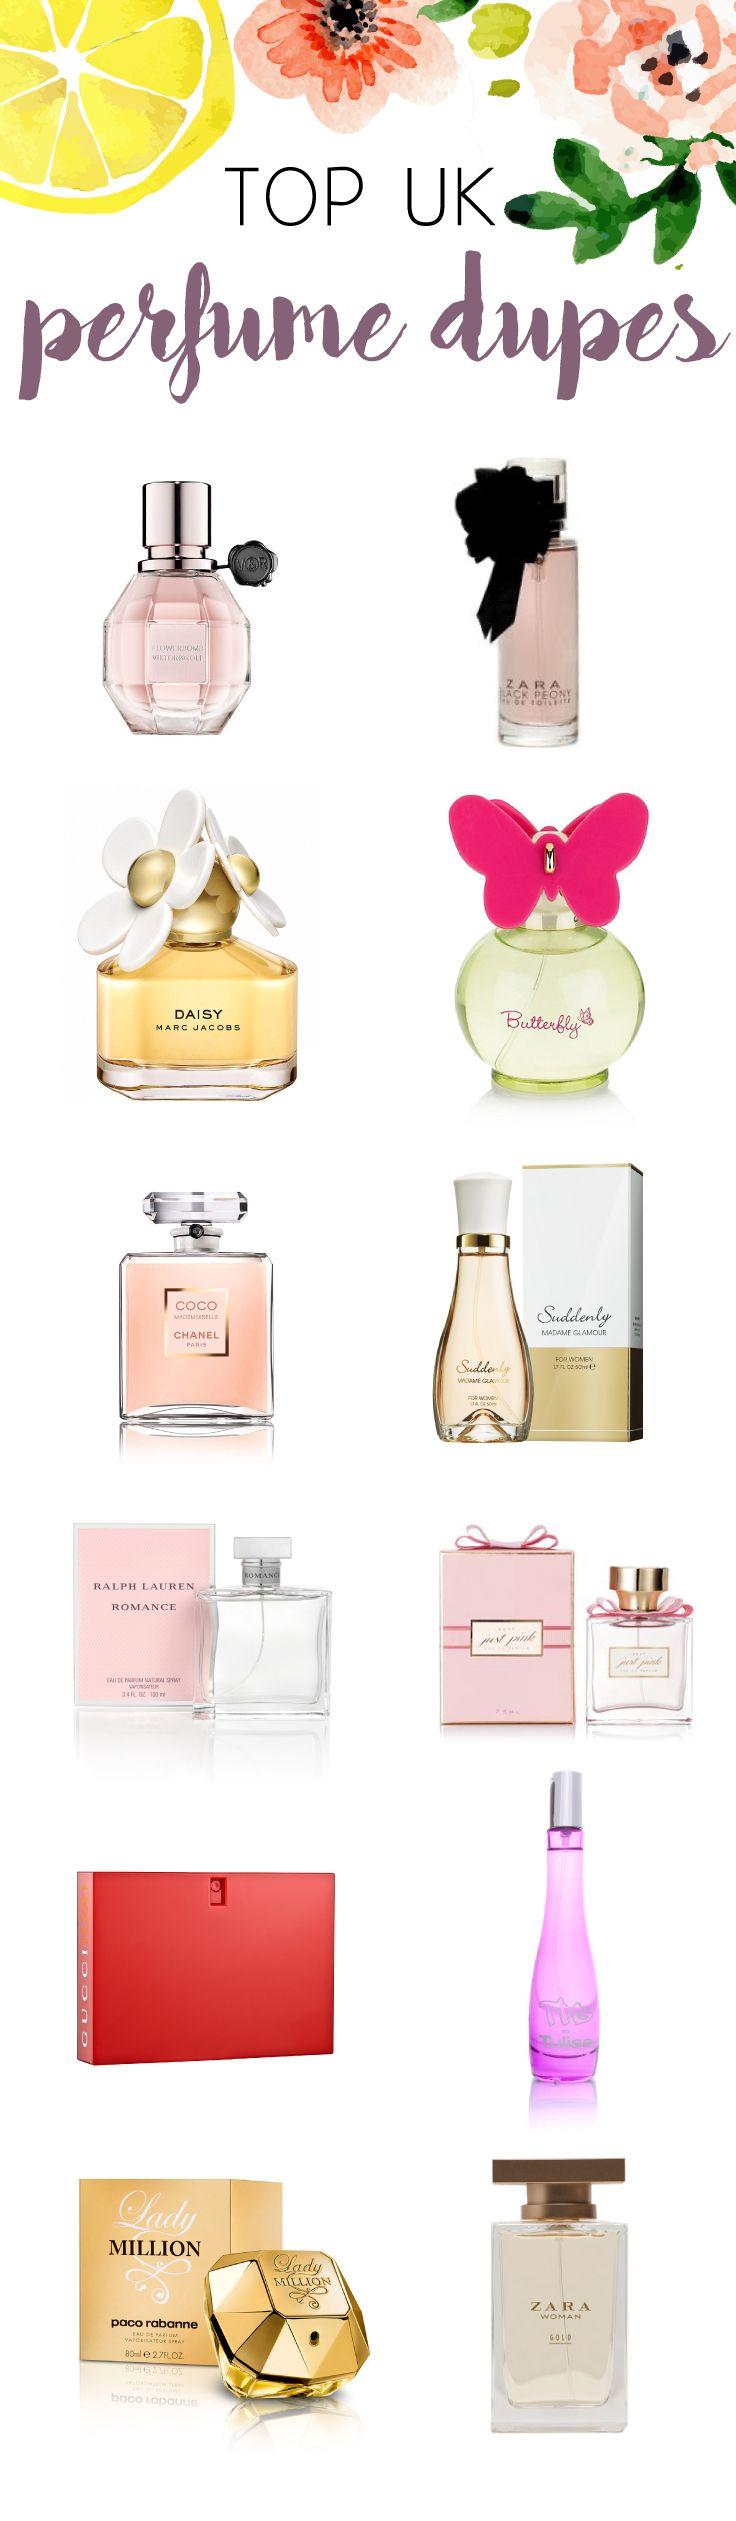 Top 8 UK Perfume Dupes